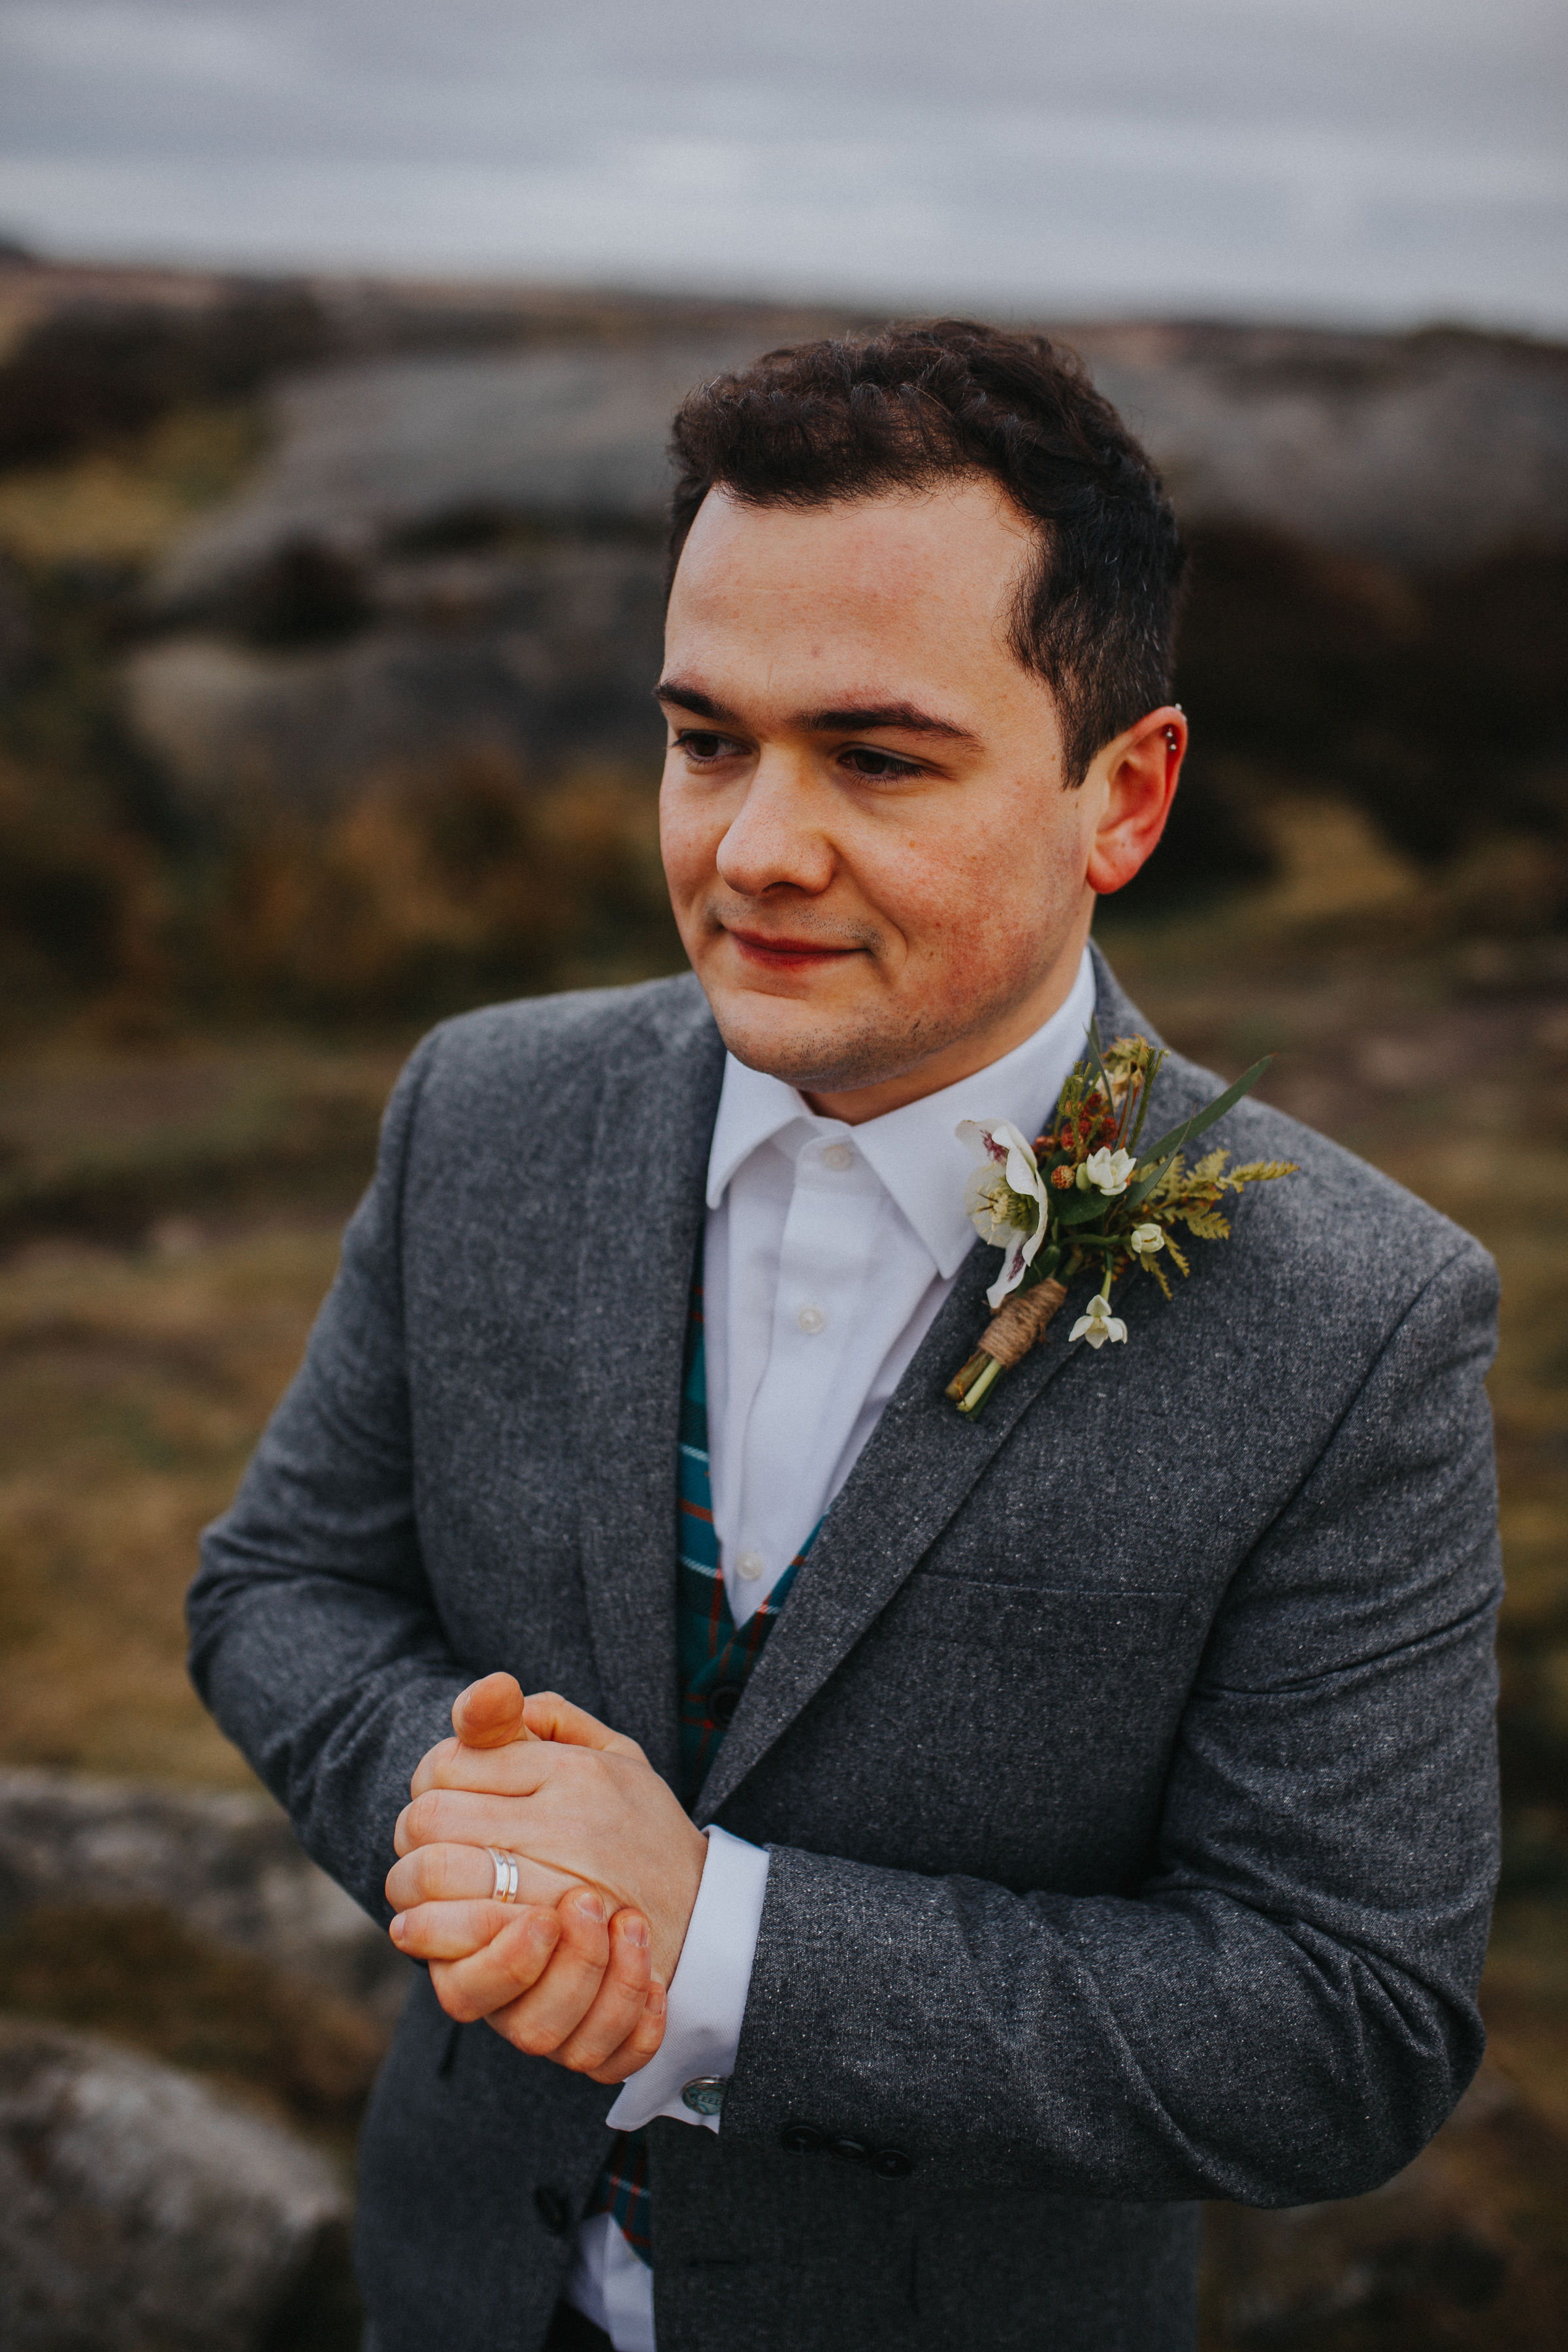 Rosie-bespoke-lace-long sleeved-tulle-wedding-dress-winter-peak district-susanna greening-19.jpg